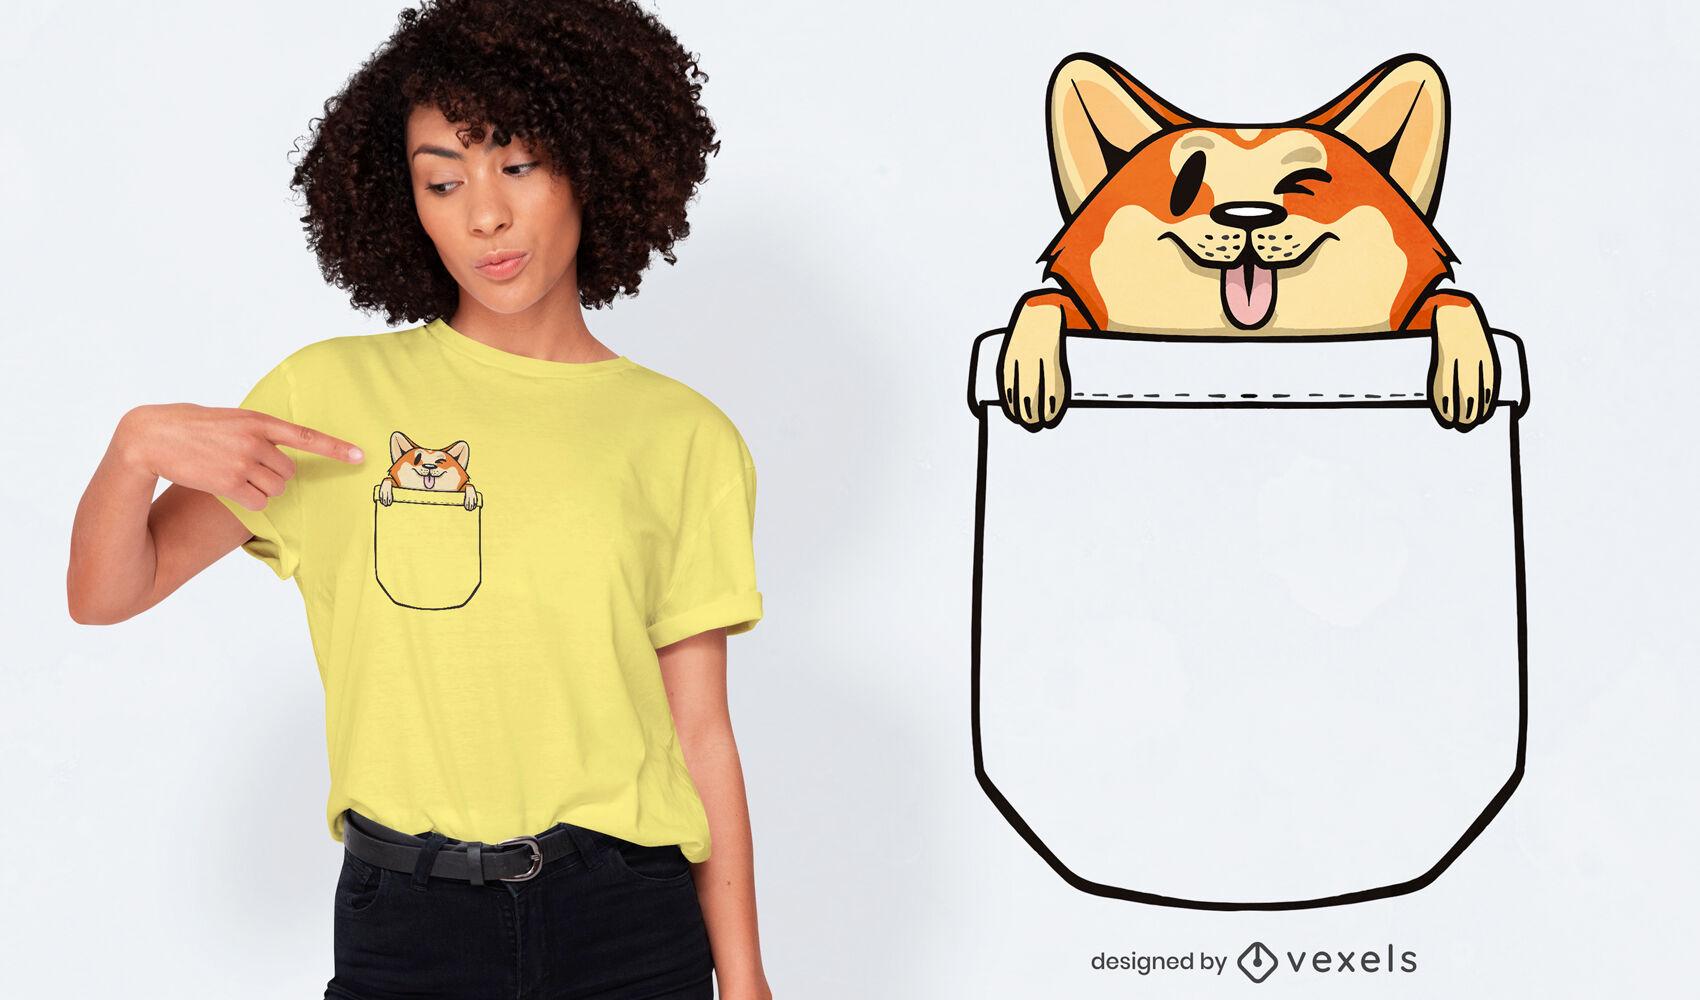 Corgi dog in pocket t-shirt design